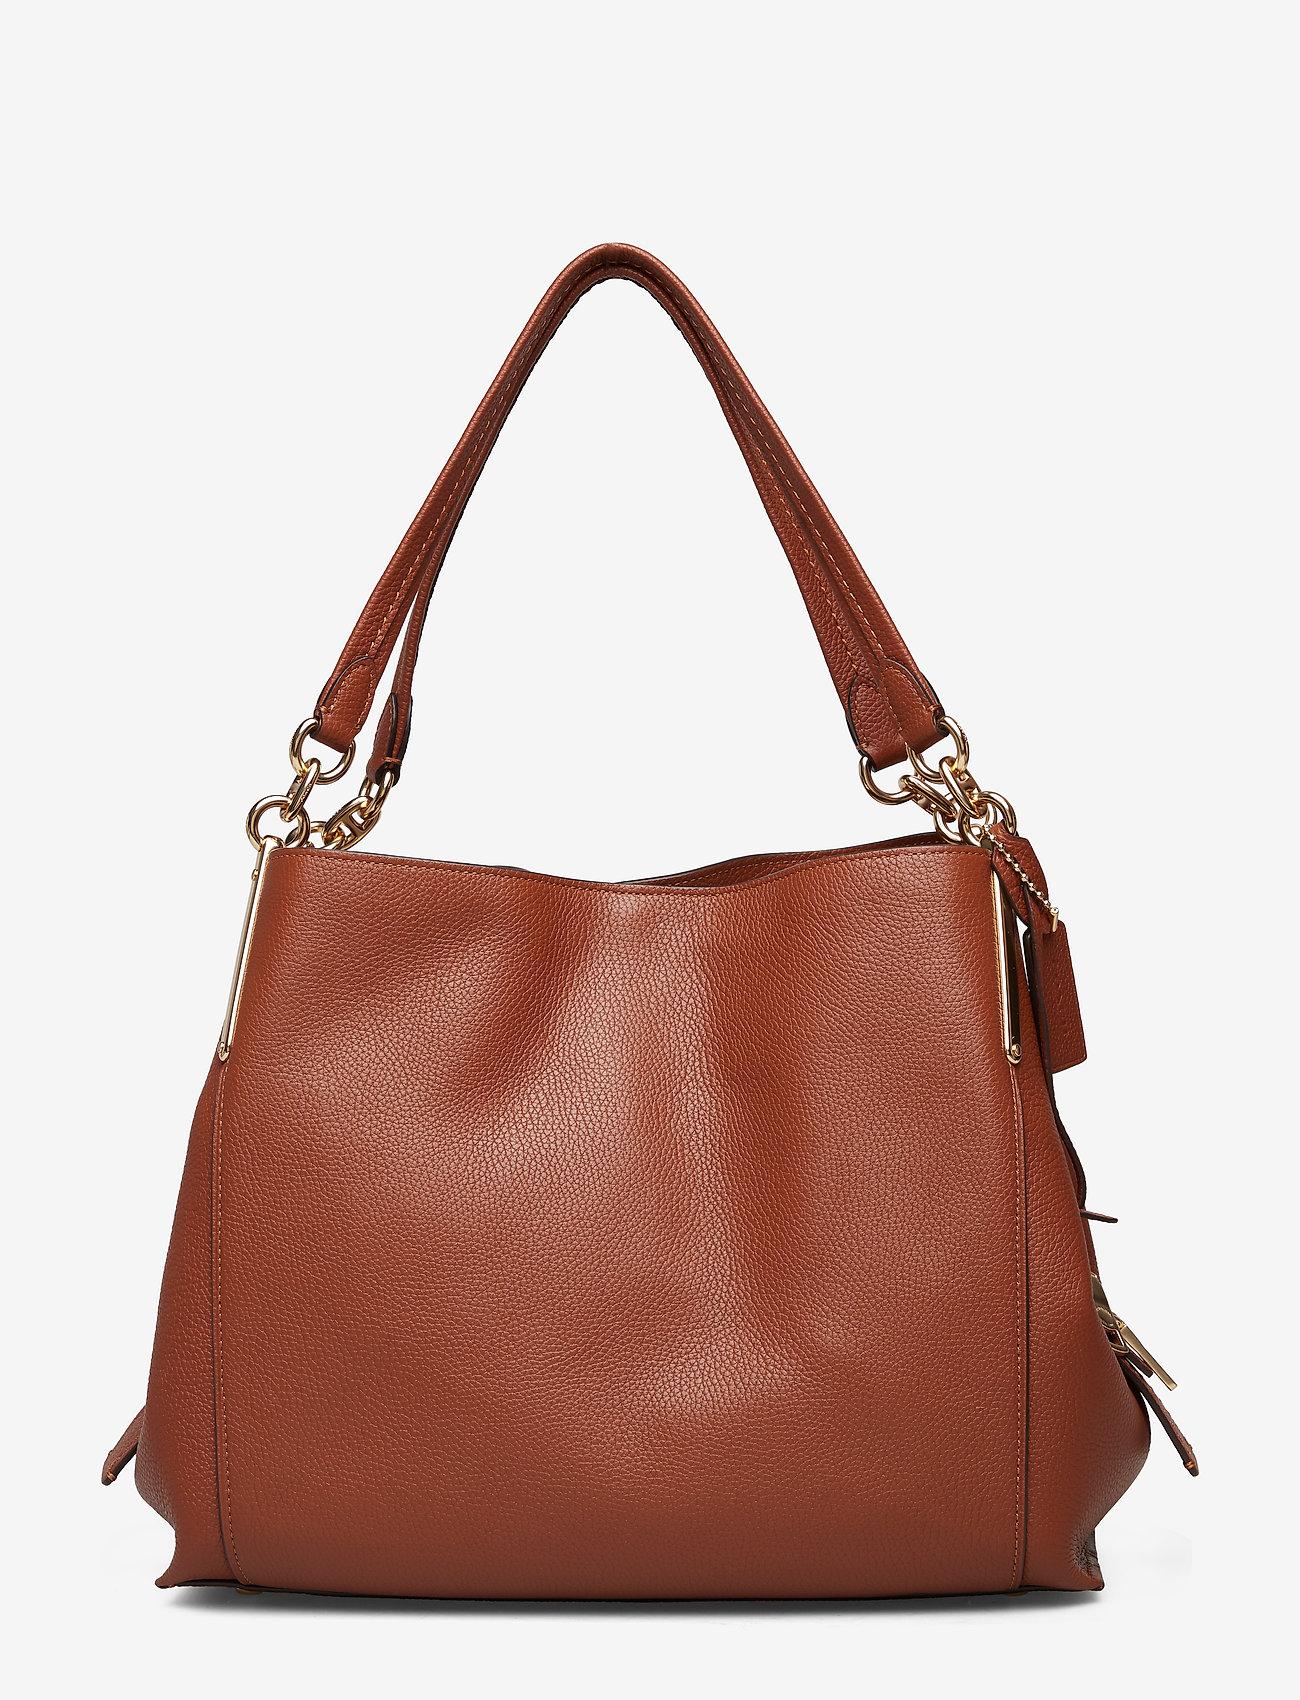 Coach - Womens Bags Shoulder Bag - top handle - gd/1941 saddle